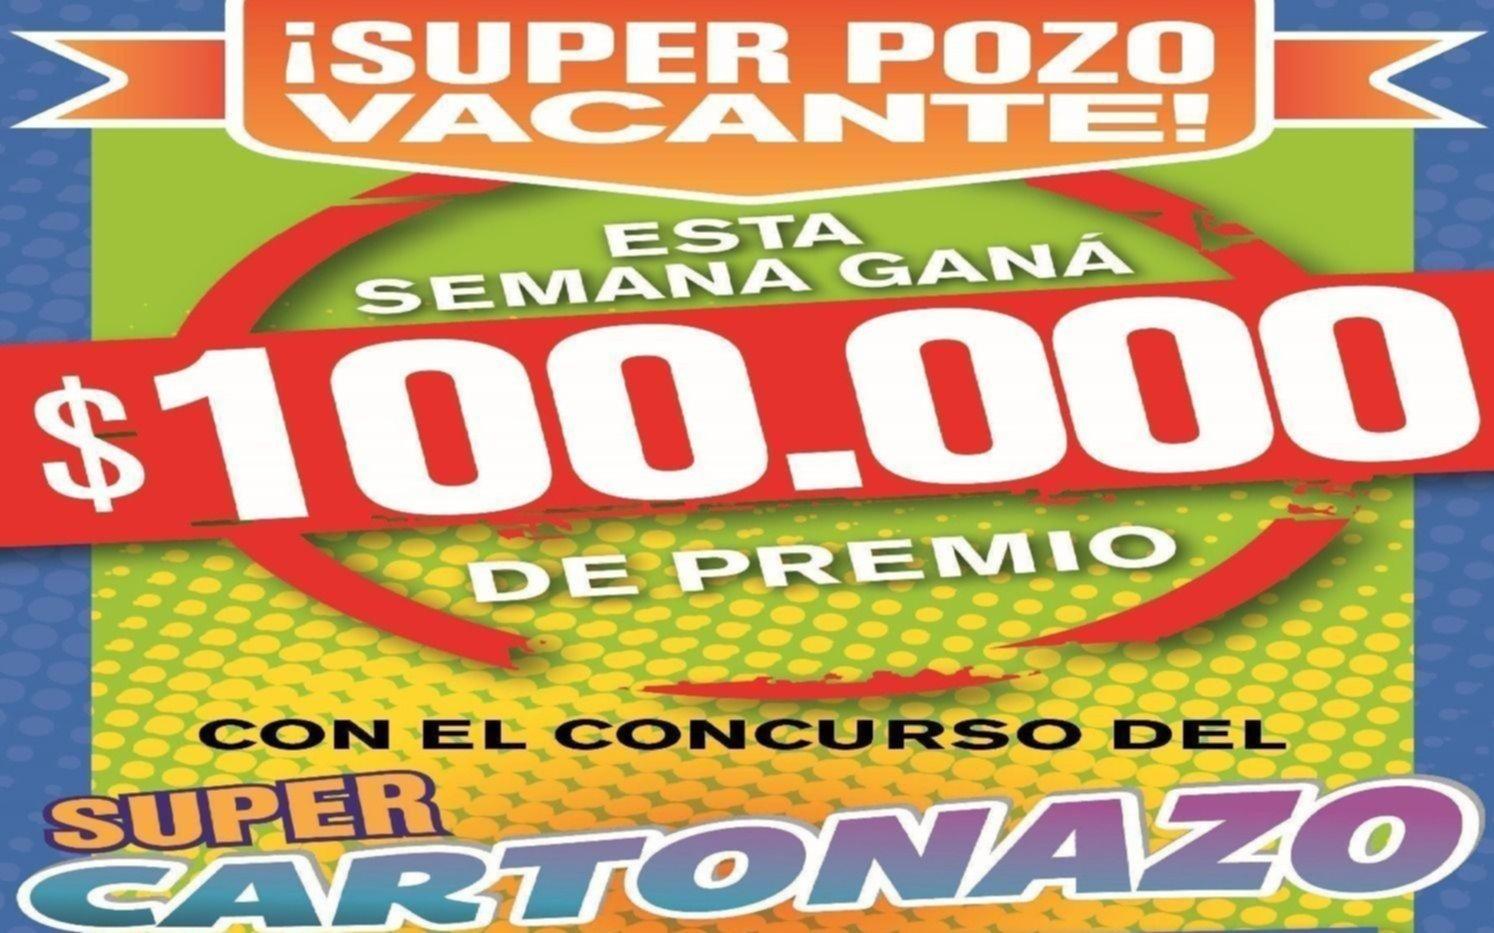 Controlá El Cartonazo, podés ganar $100.000